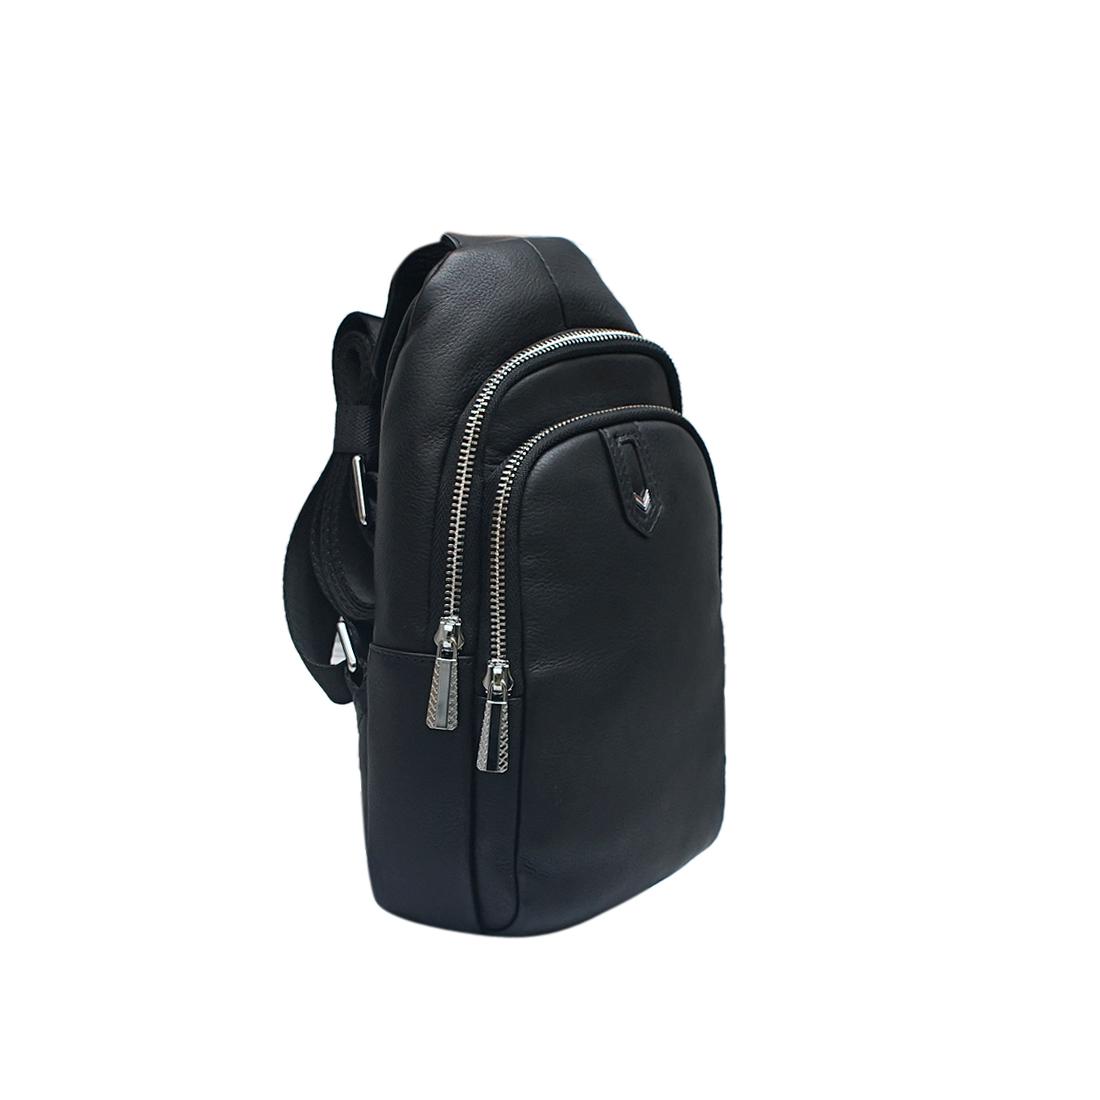 Túi đeo vai nam da bò thật cao cấp màu đen EB303